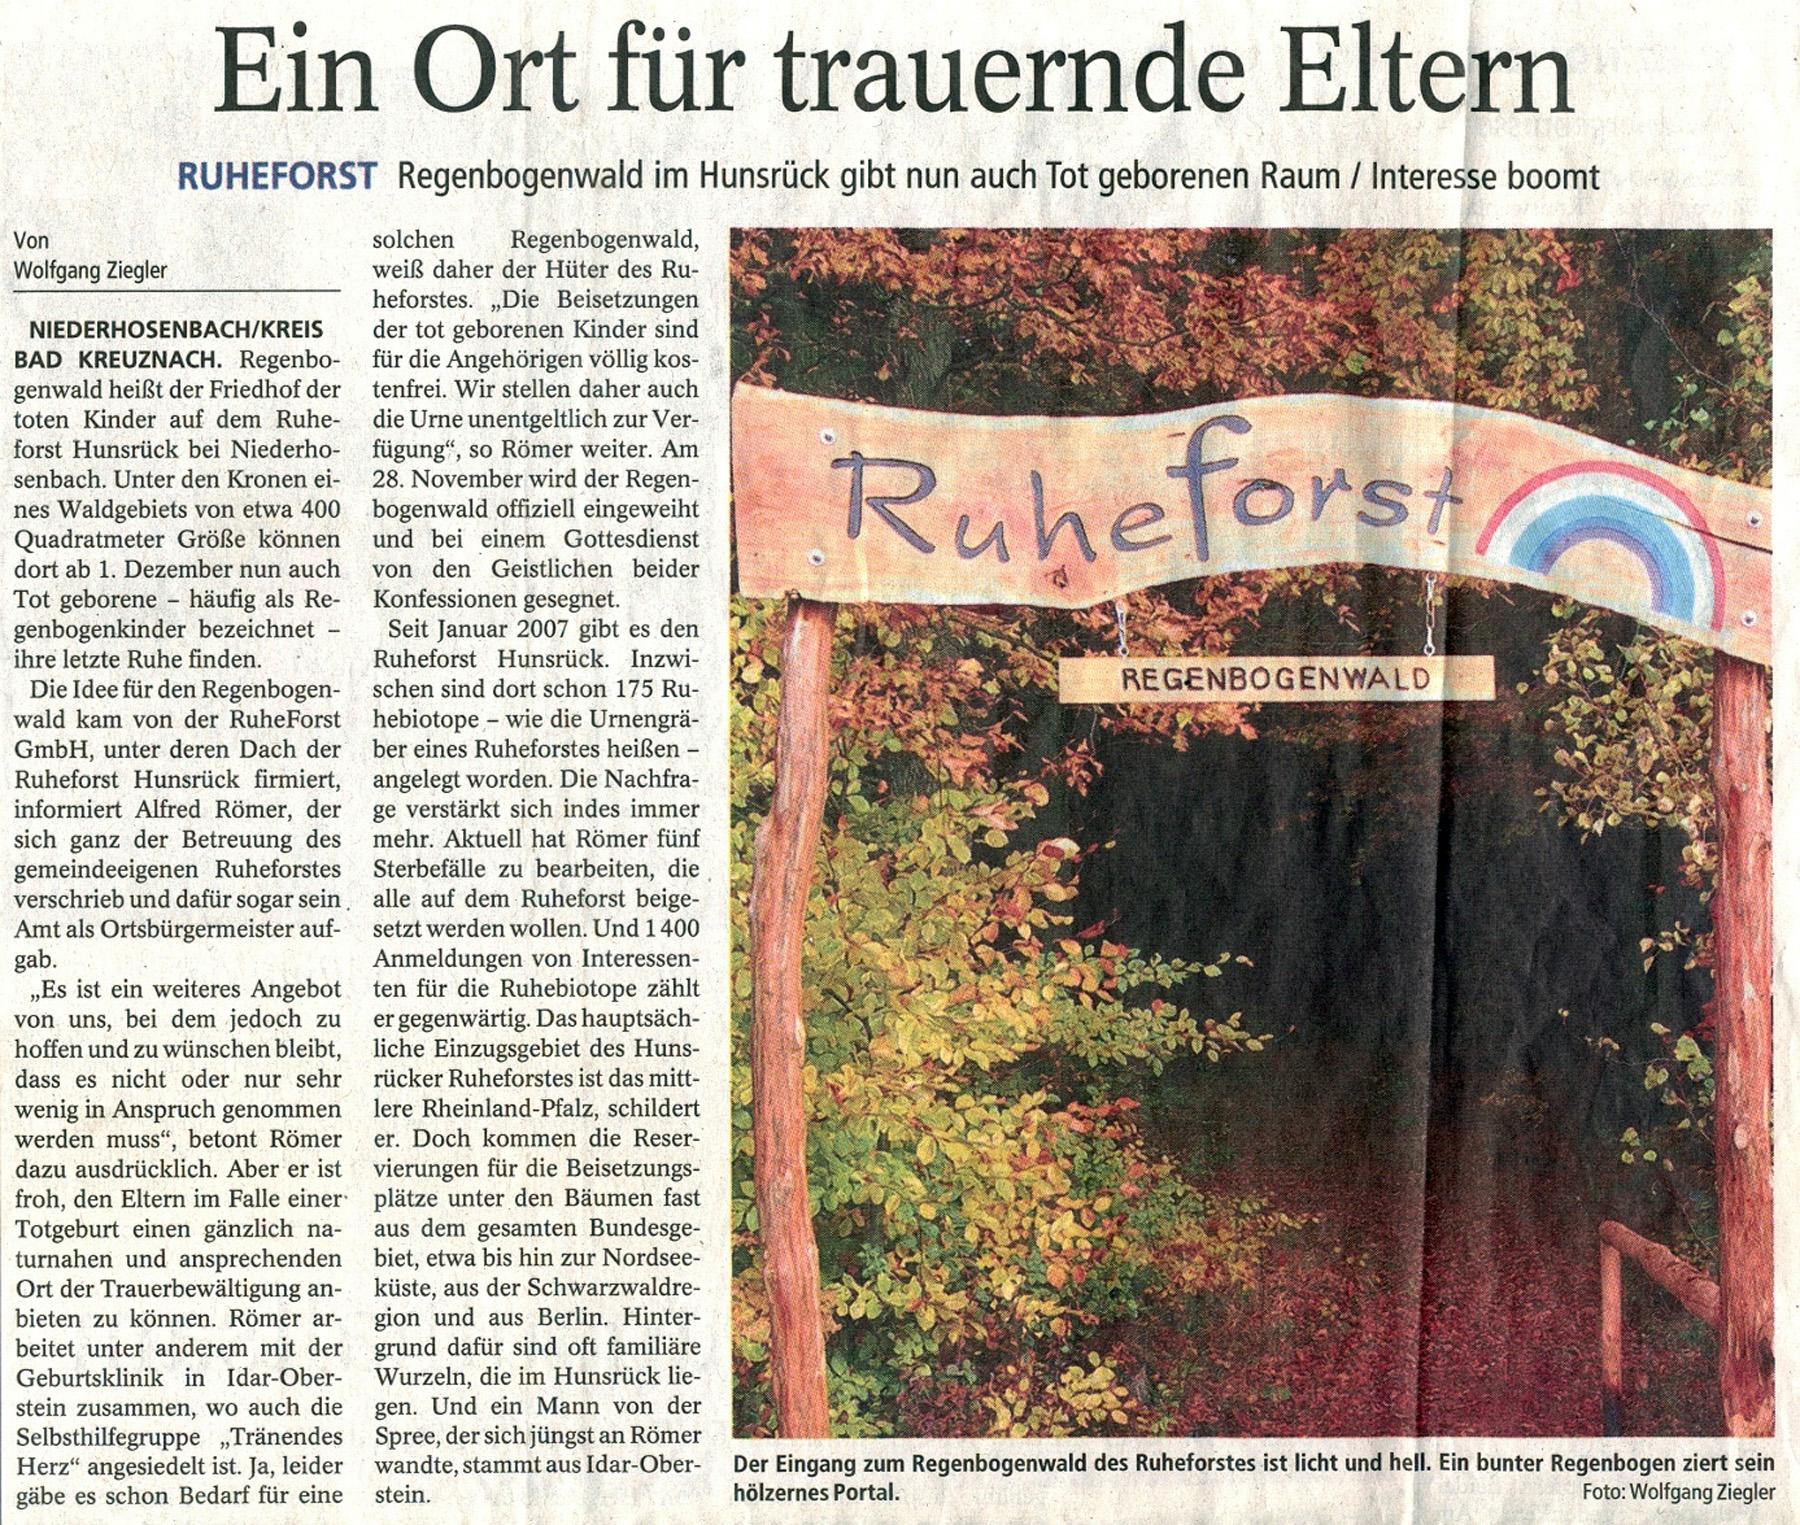 2009.11.14. Rhein-Main-Presse - Kopie